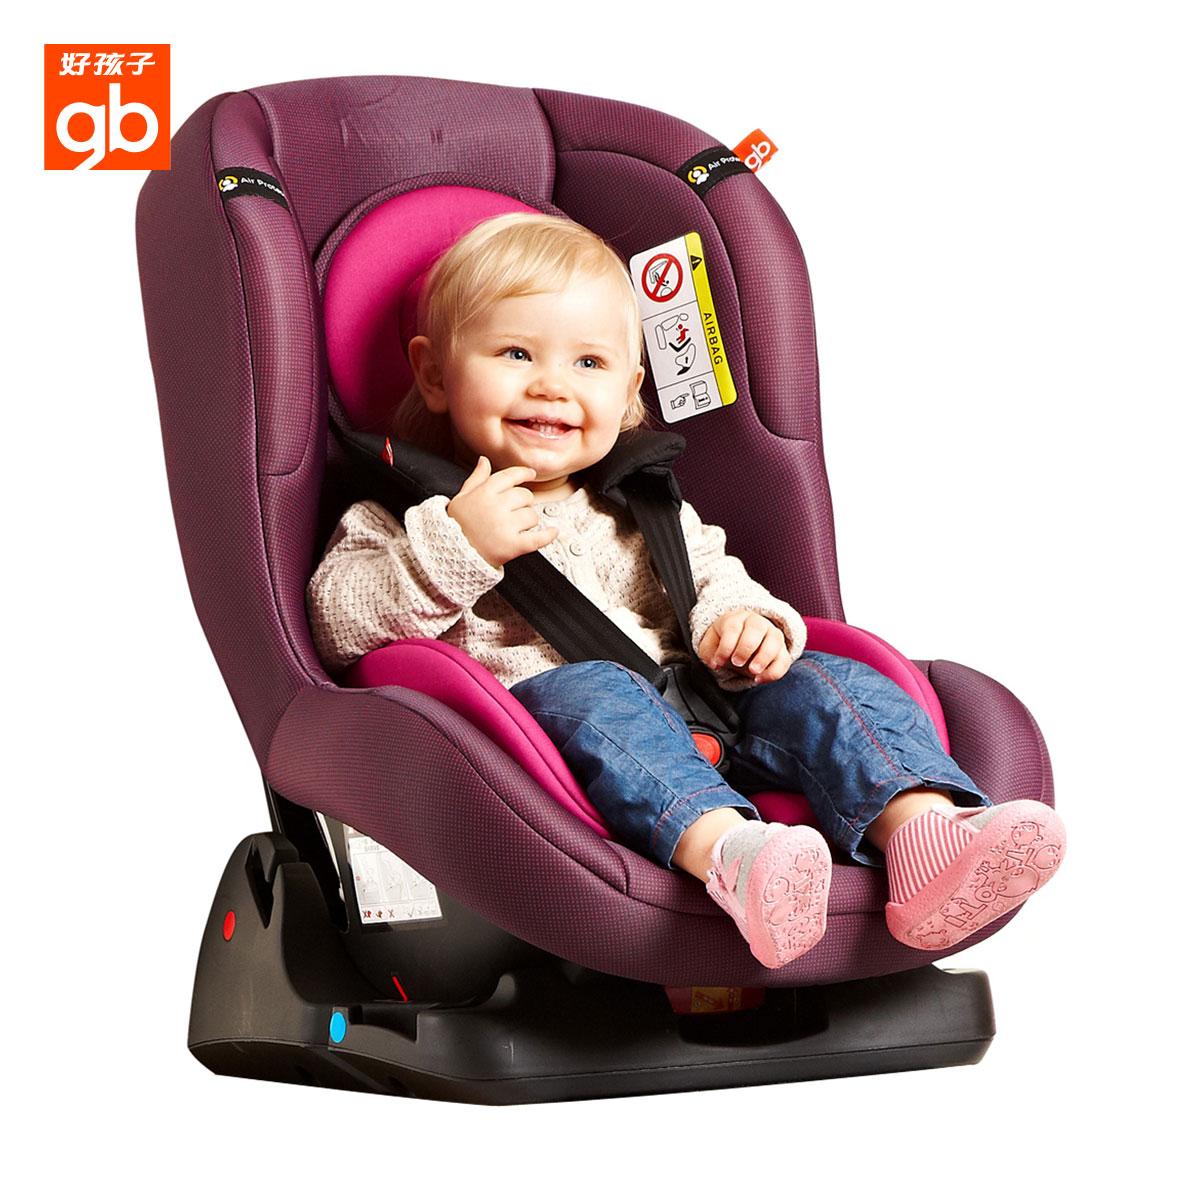 World famous brand gb child car seat CS308 Goodbaby European standard ISOFIX install dual seat Free shipping(China (Mainland))